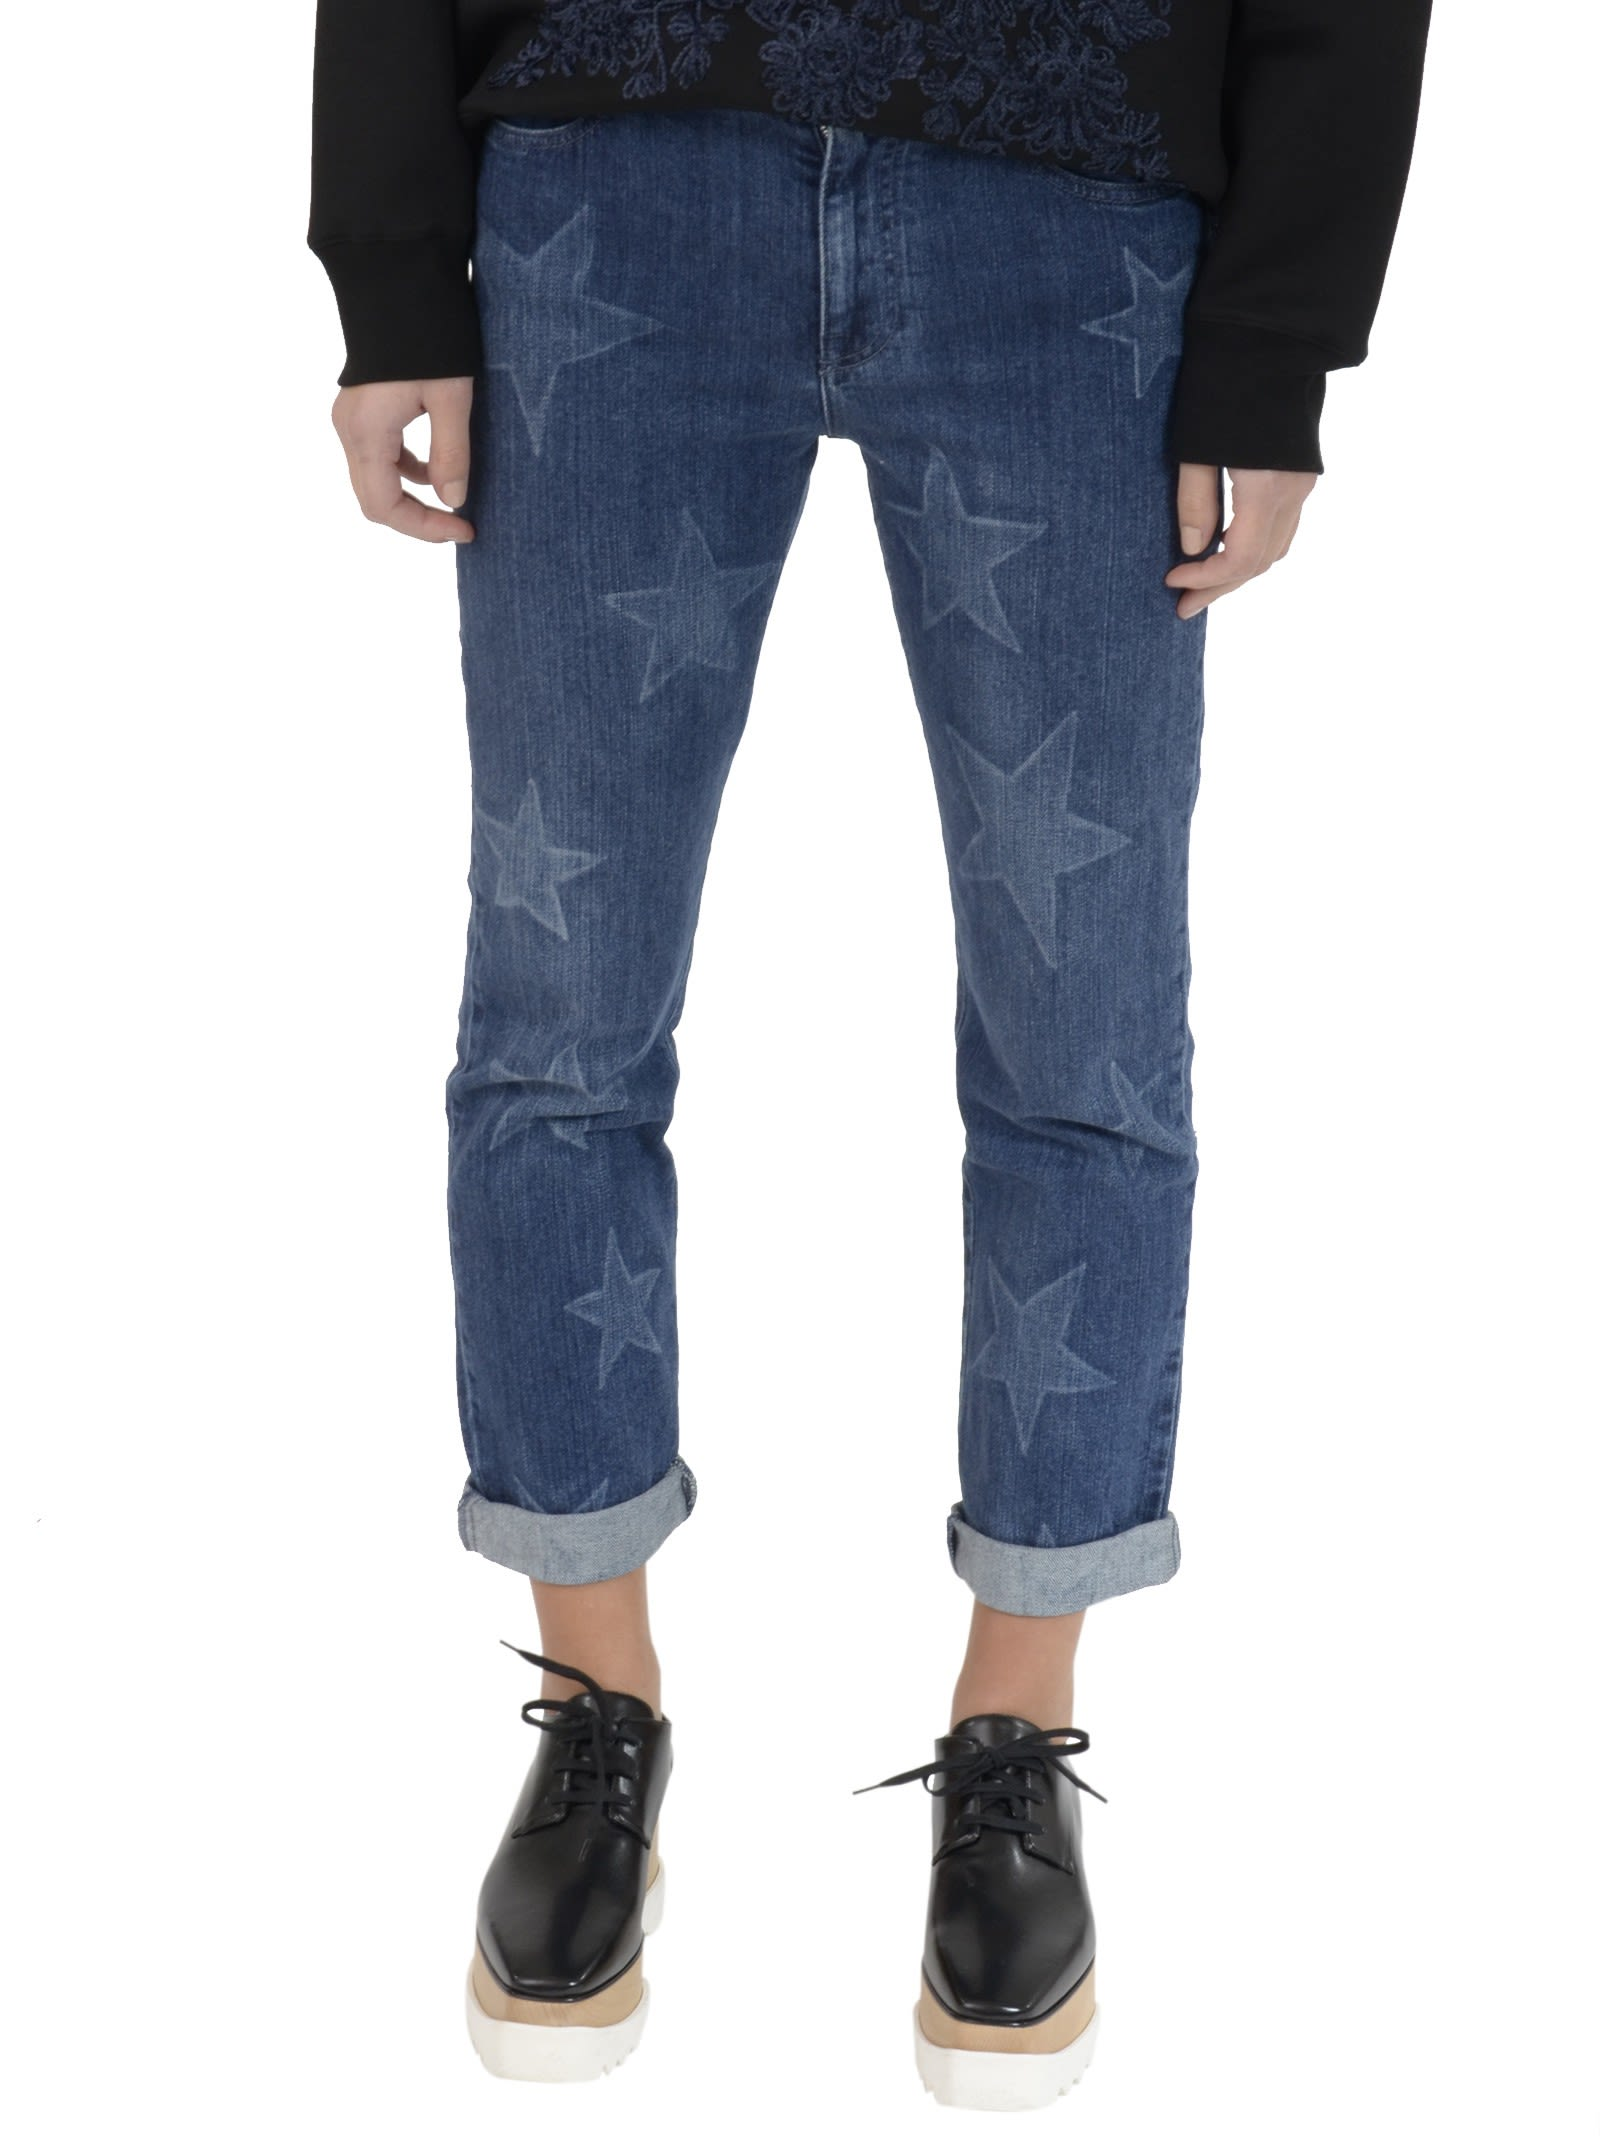 Stella McCartney Dark Blue Star Printed Jeans 9168500